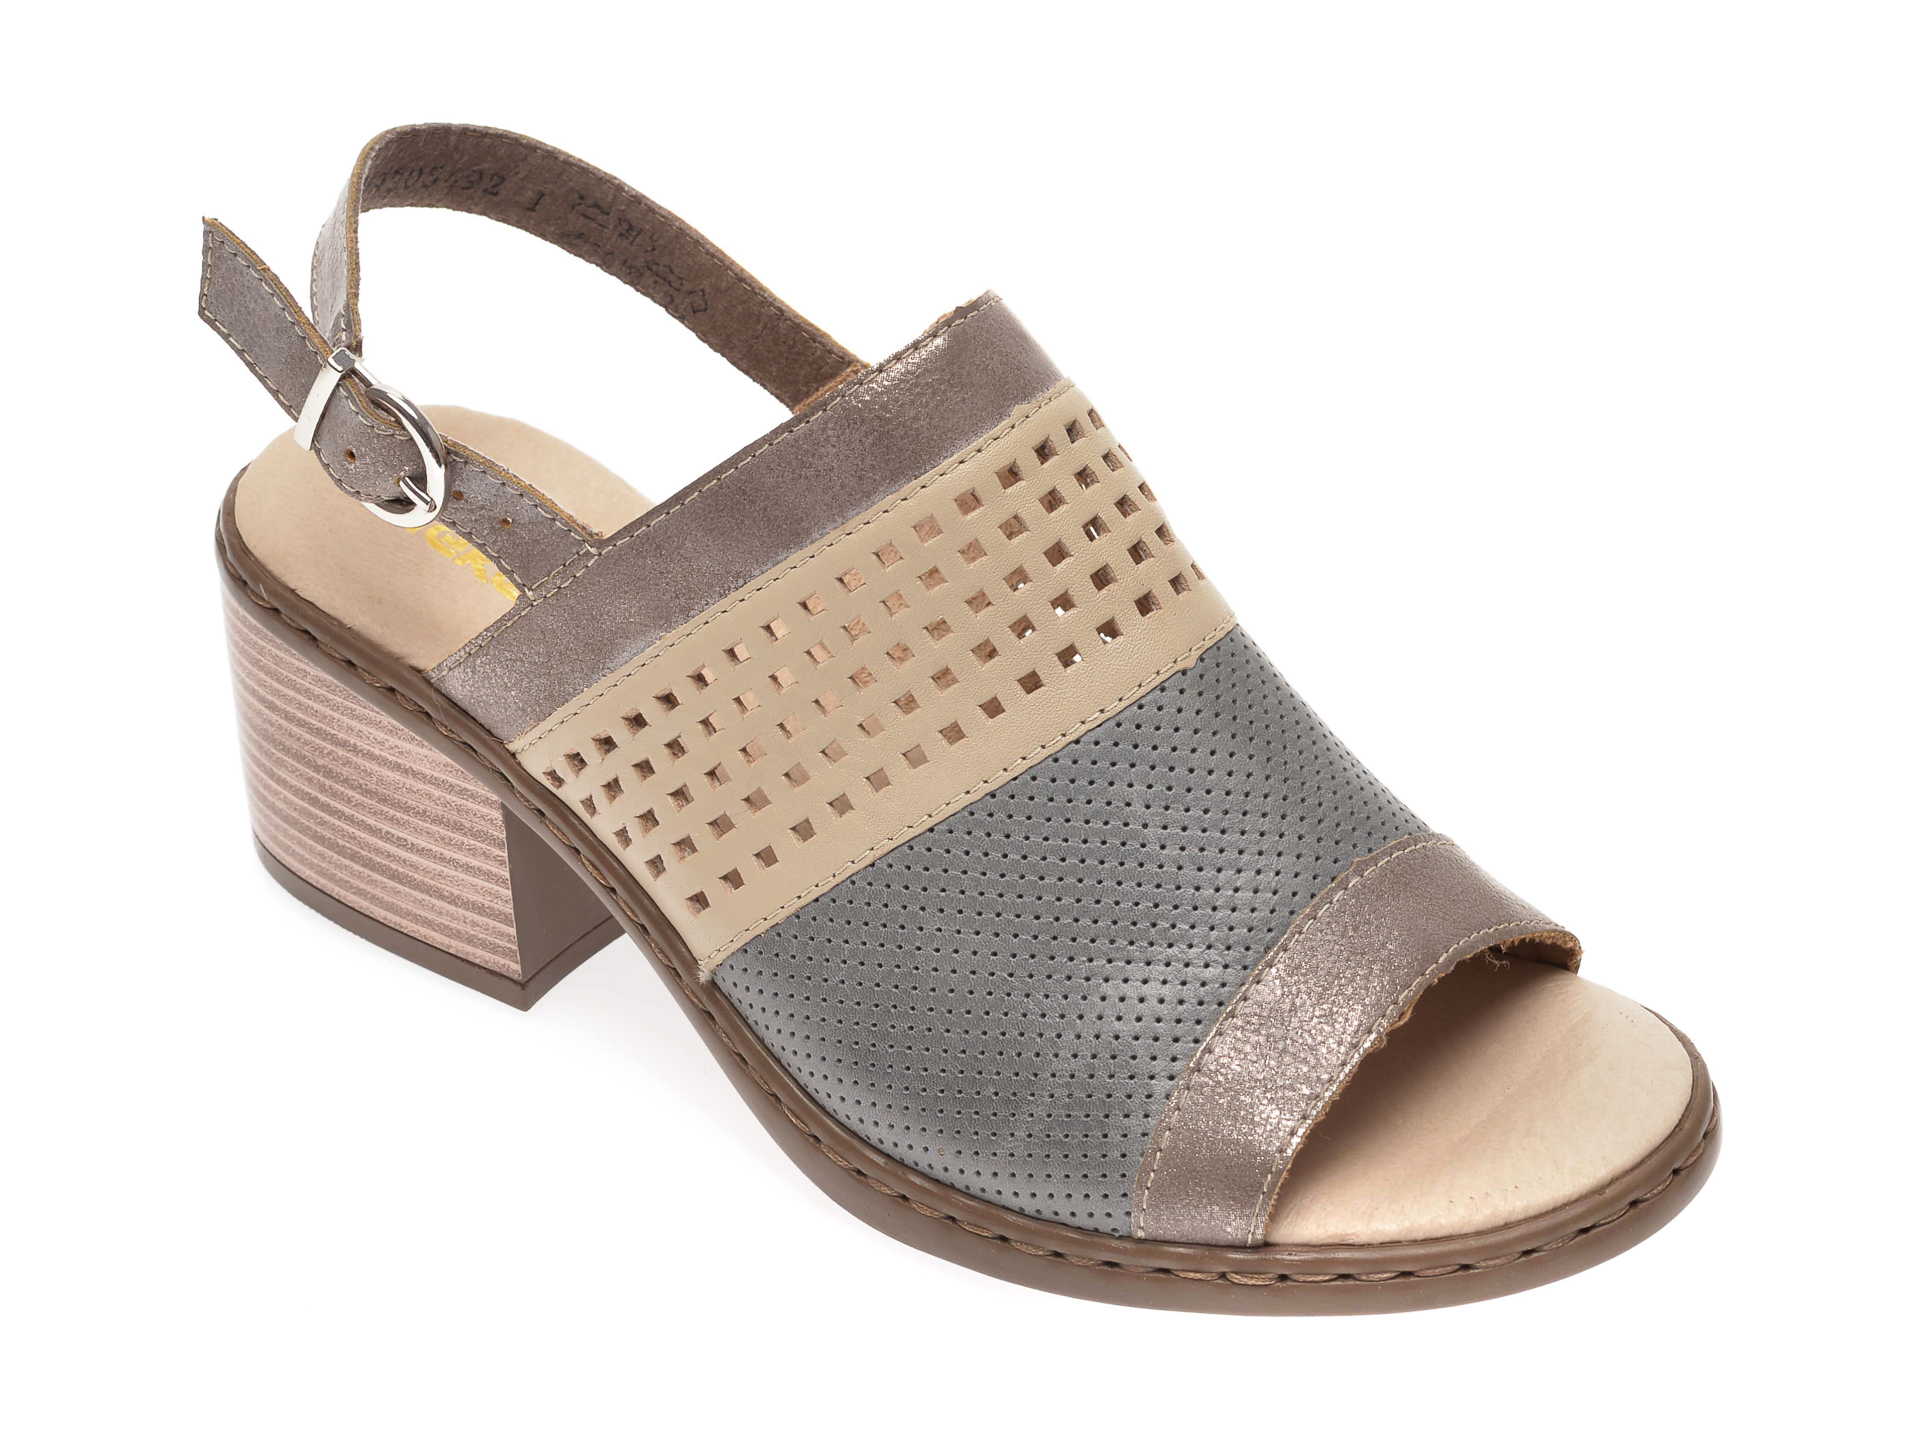 Sandale RIEKER gri, V0575, din piele naturala